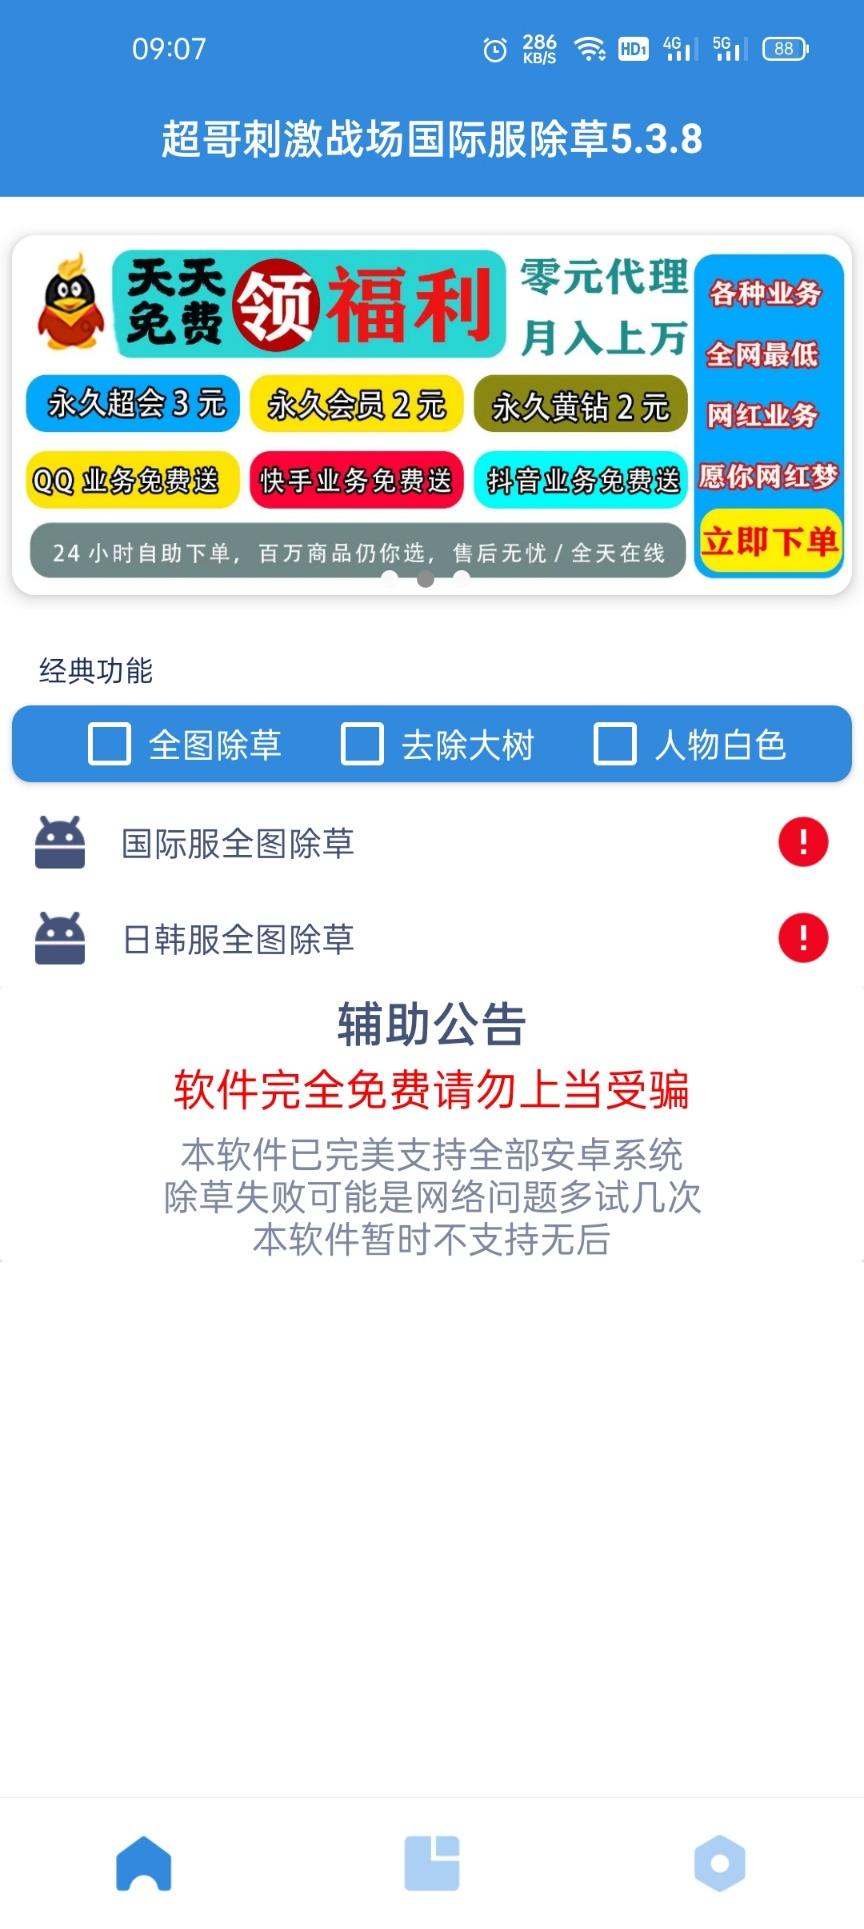 Screenshot_2021-06-04-09-07-09-33_554529c0cae77c3528cc092c41f43bf6.jpg